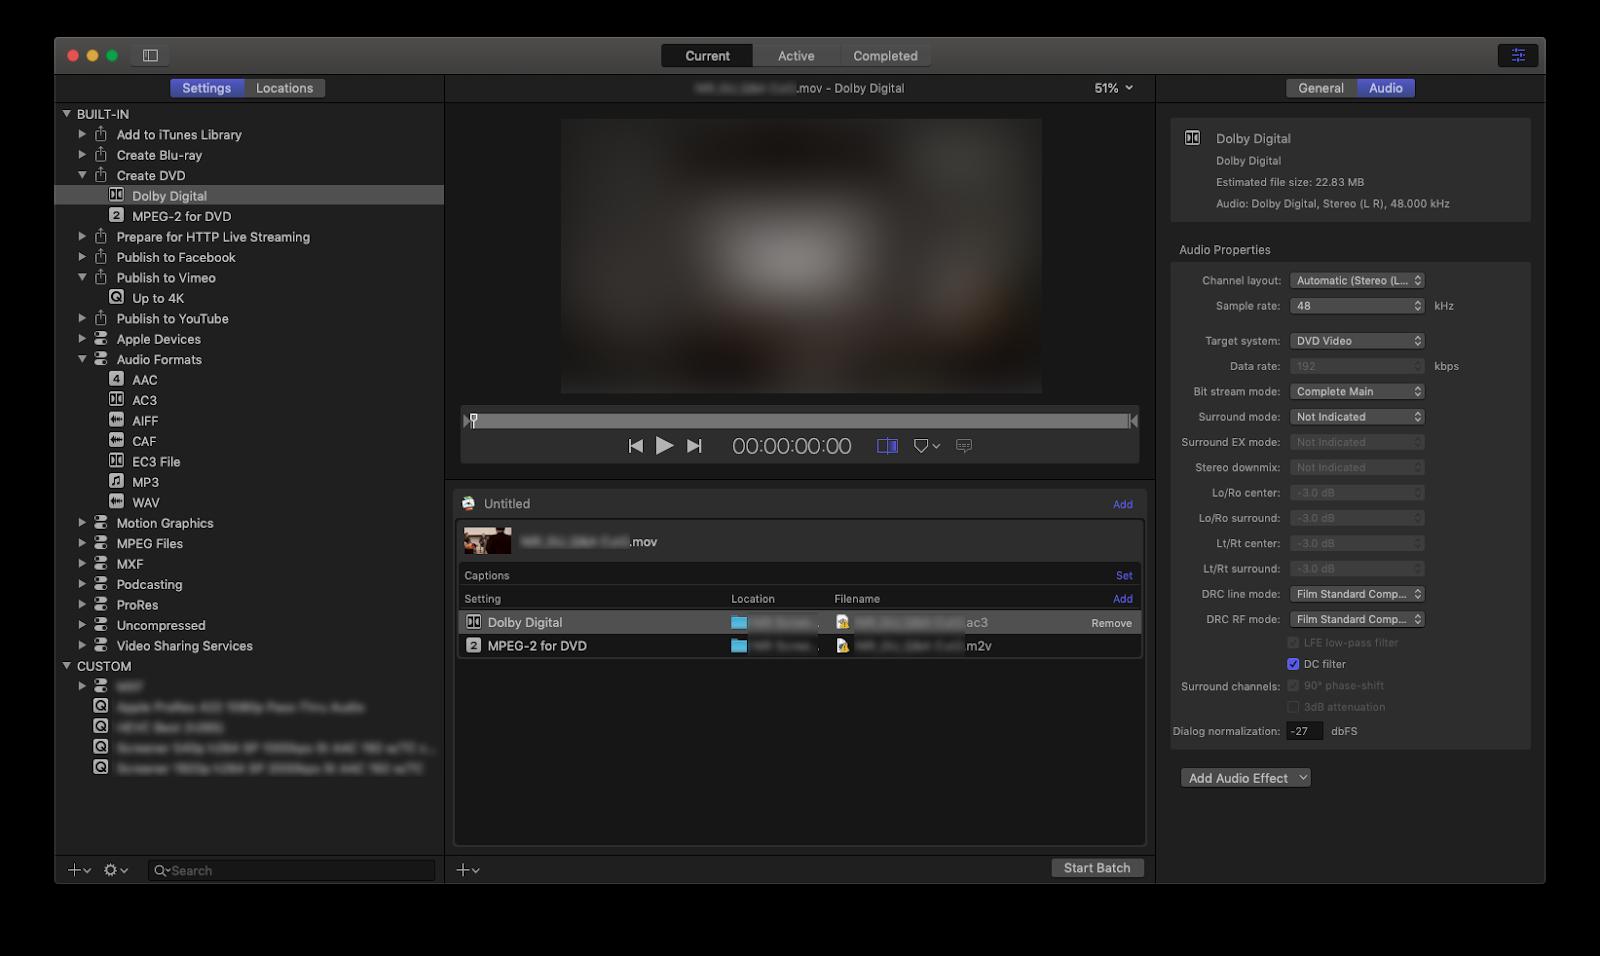 human user: Adobe Encore CS6 still works on macOS 10 14 Mojave